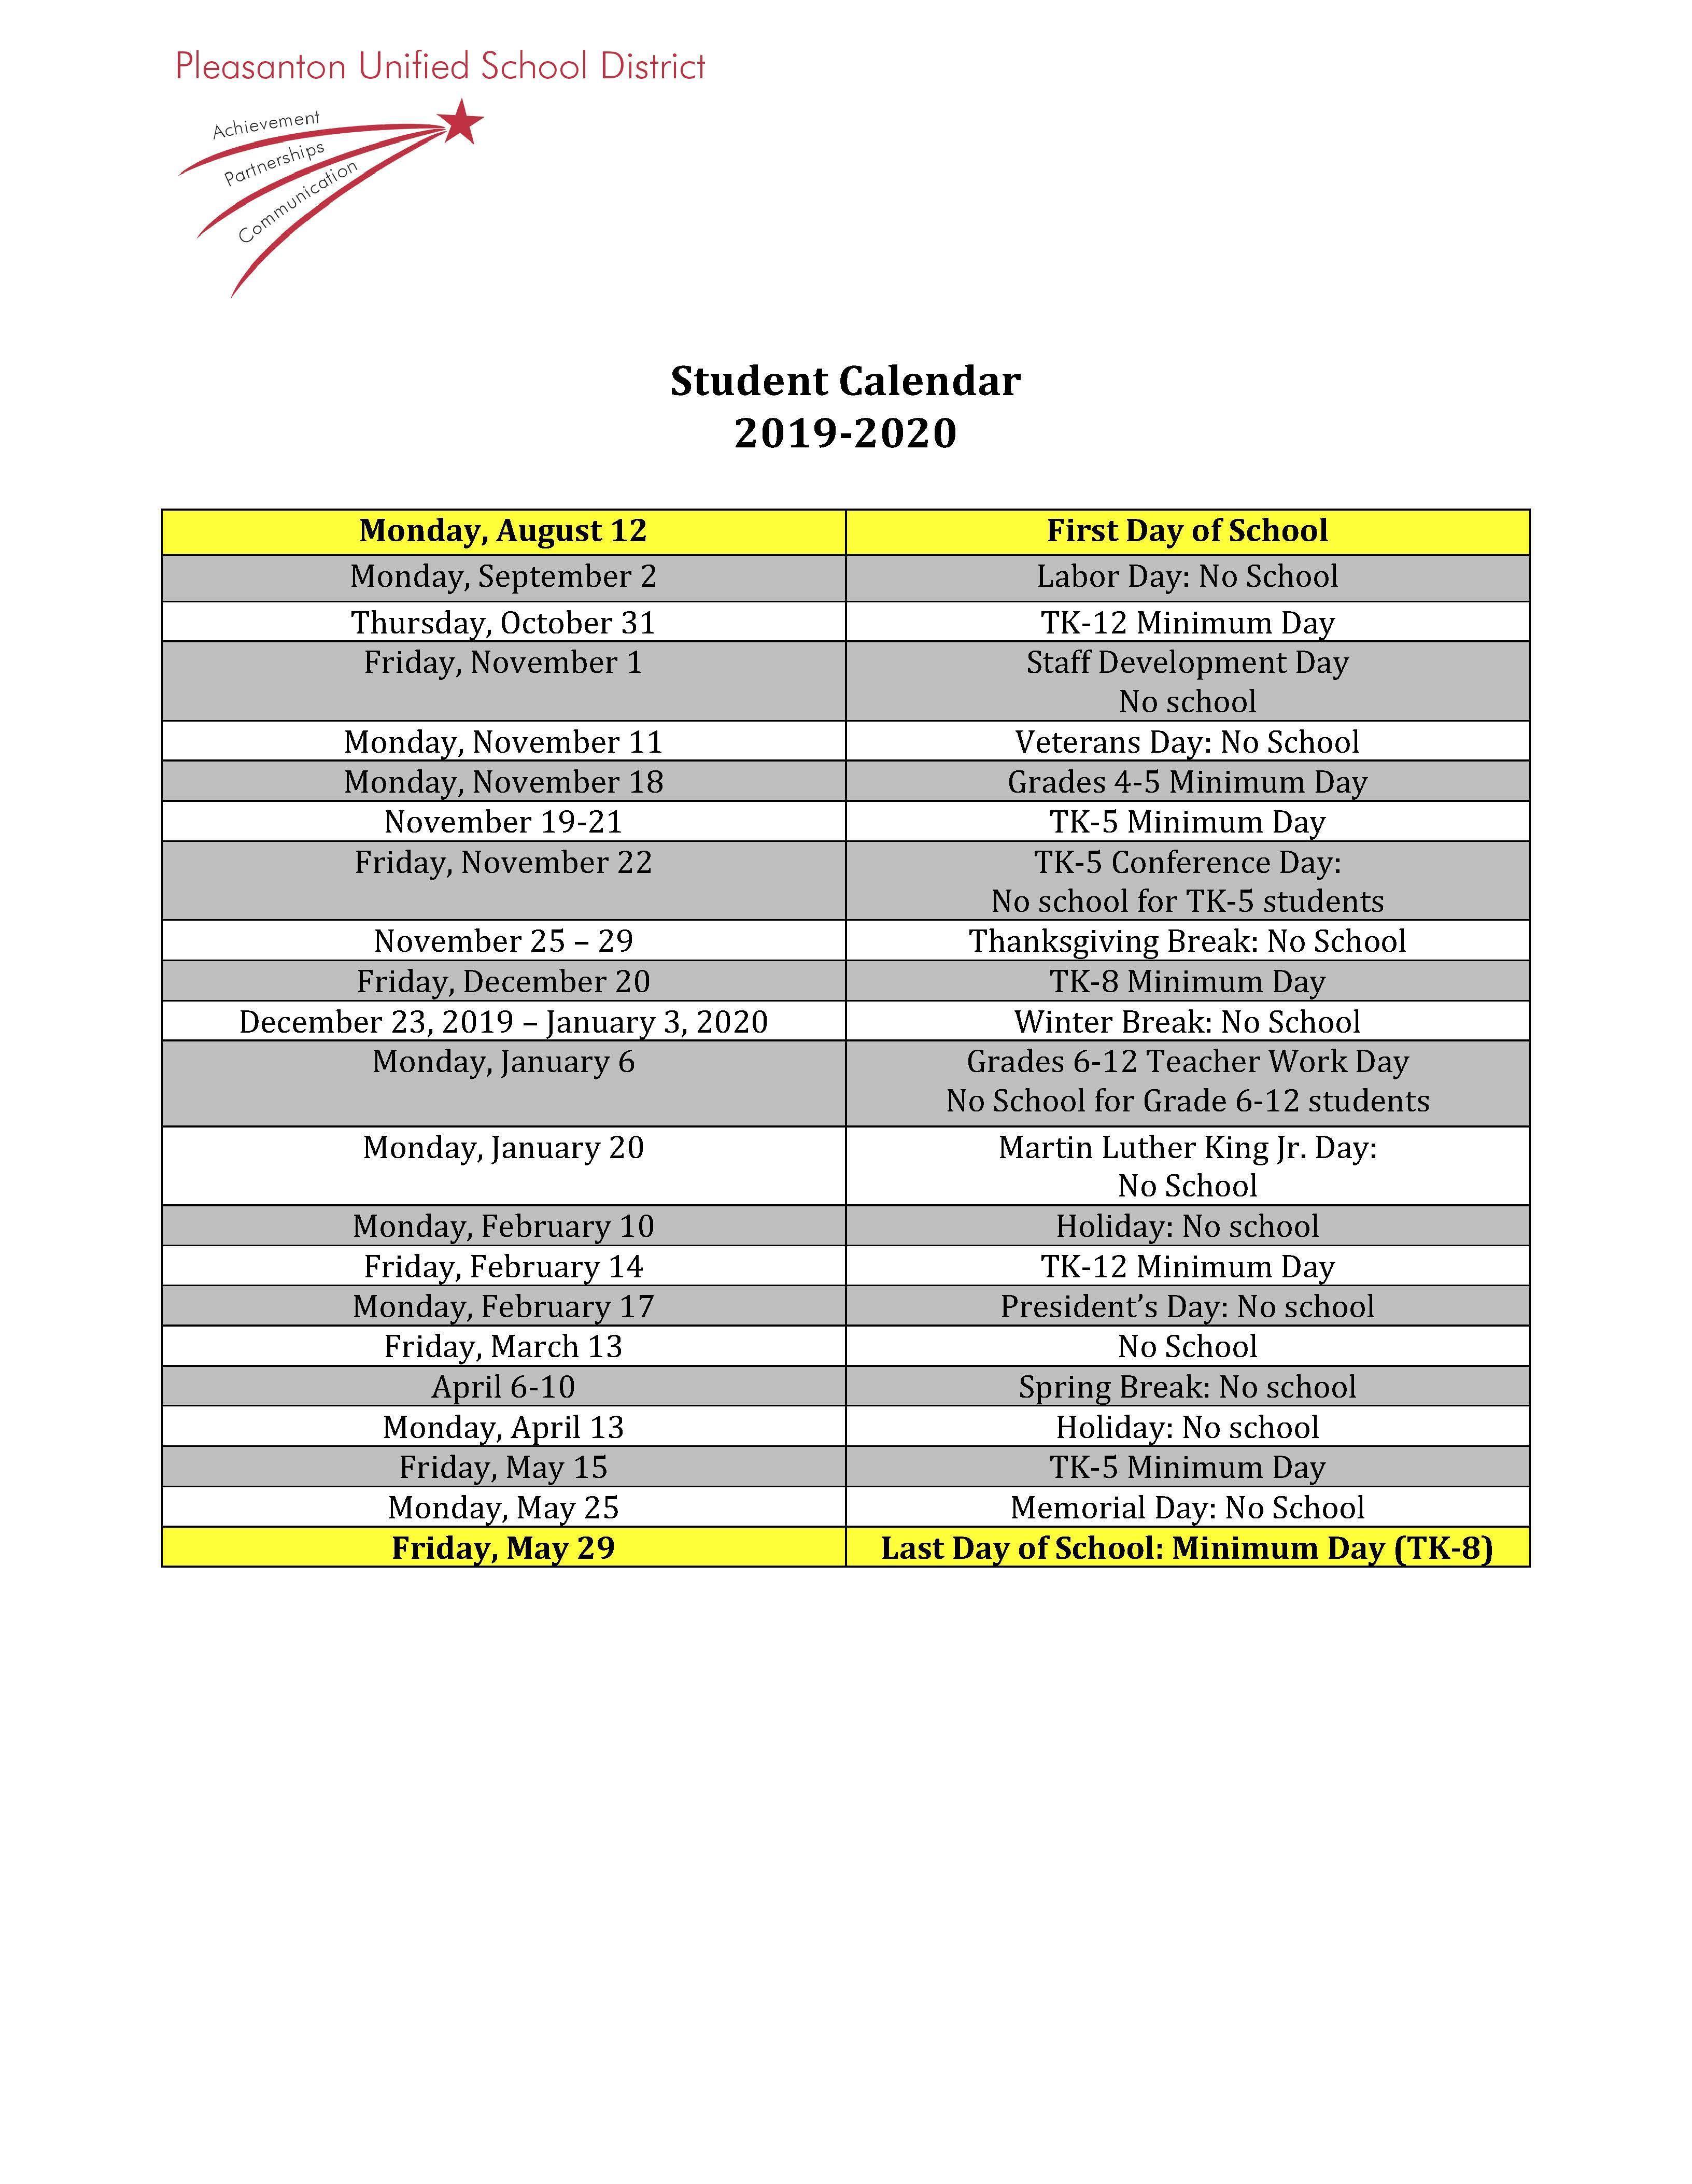 Calendars – Miscellaneous – Pleasanton Unified School District Within Schedule For Menlo Parkschool District